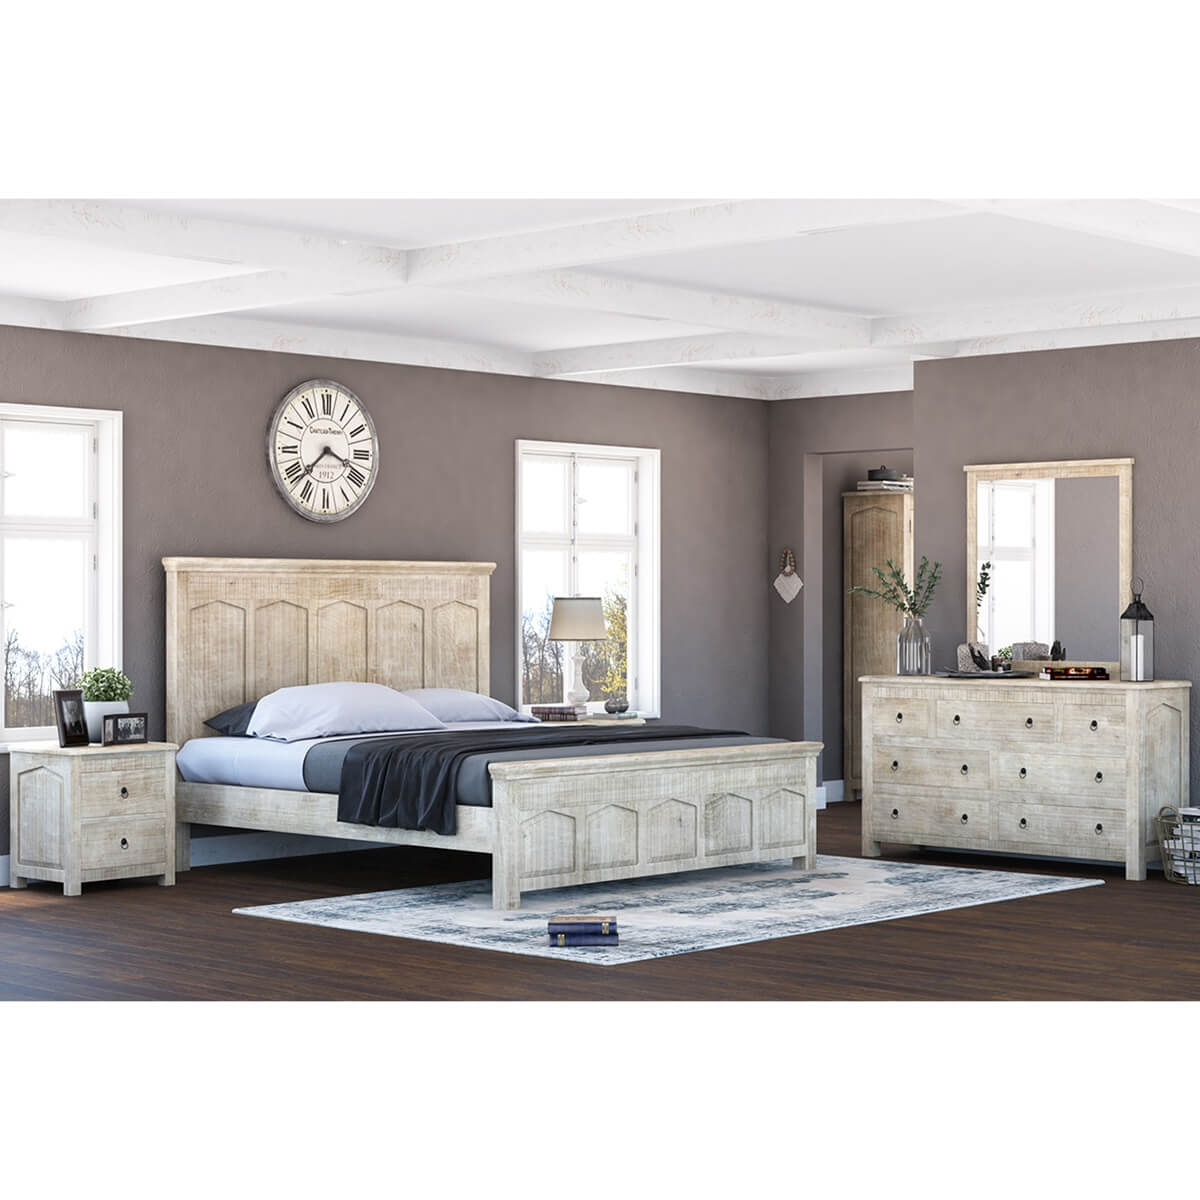 Mission Winter White 4 Piece Bedroom Set